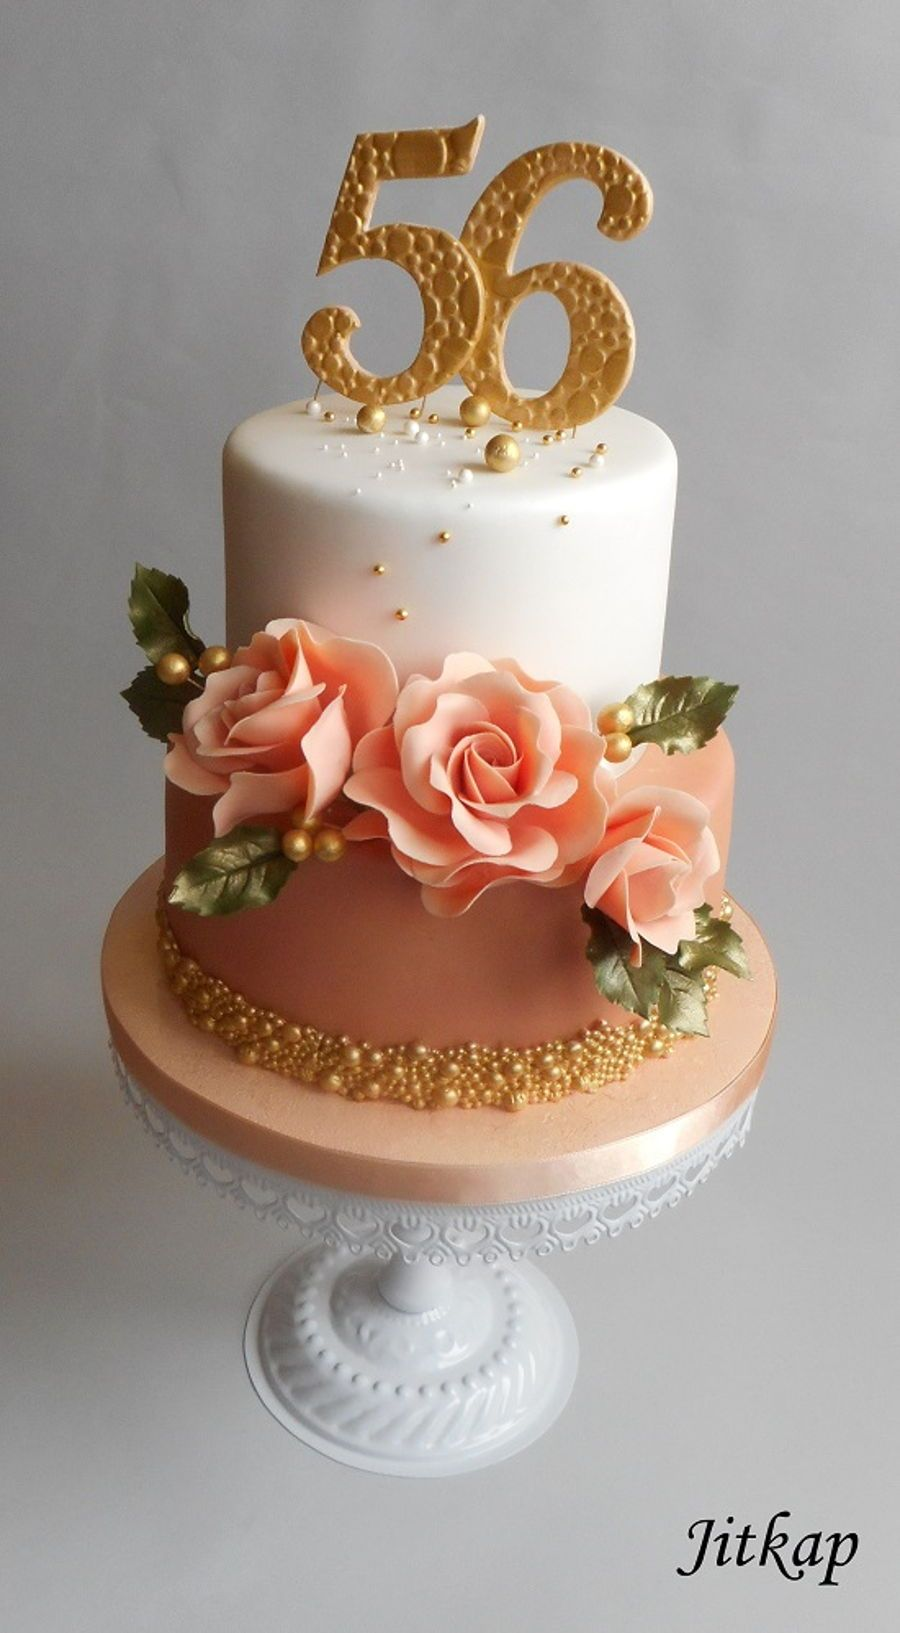 Pleasant Moms 50Th Bday Birthday Cake Roses Birthday Cakes For Women Personalised Birthday Cards Veneteletsinfo